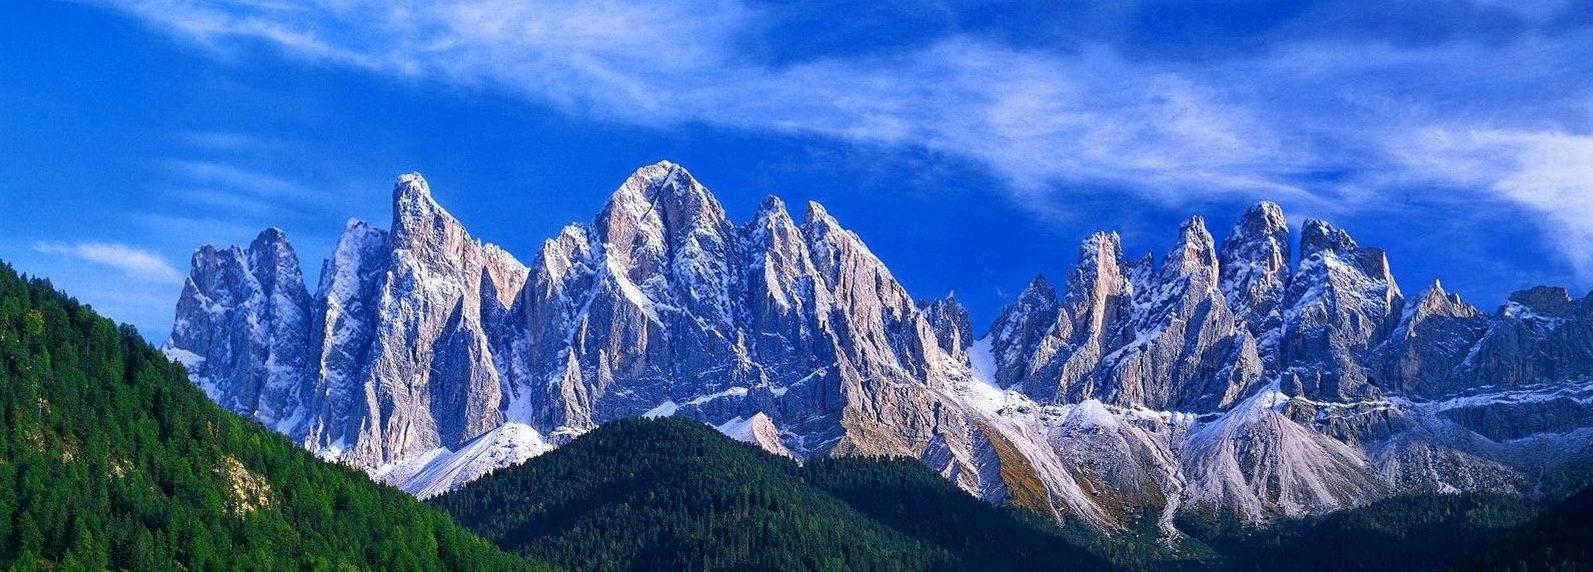 mountains-sky-trees.jpg